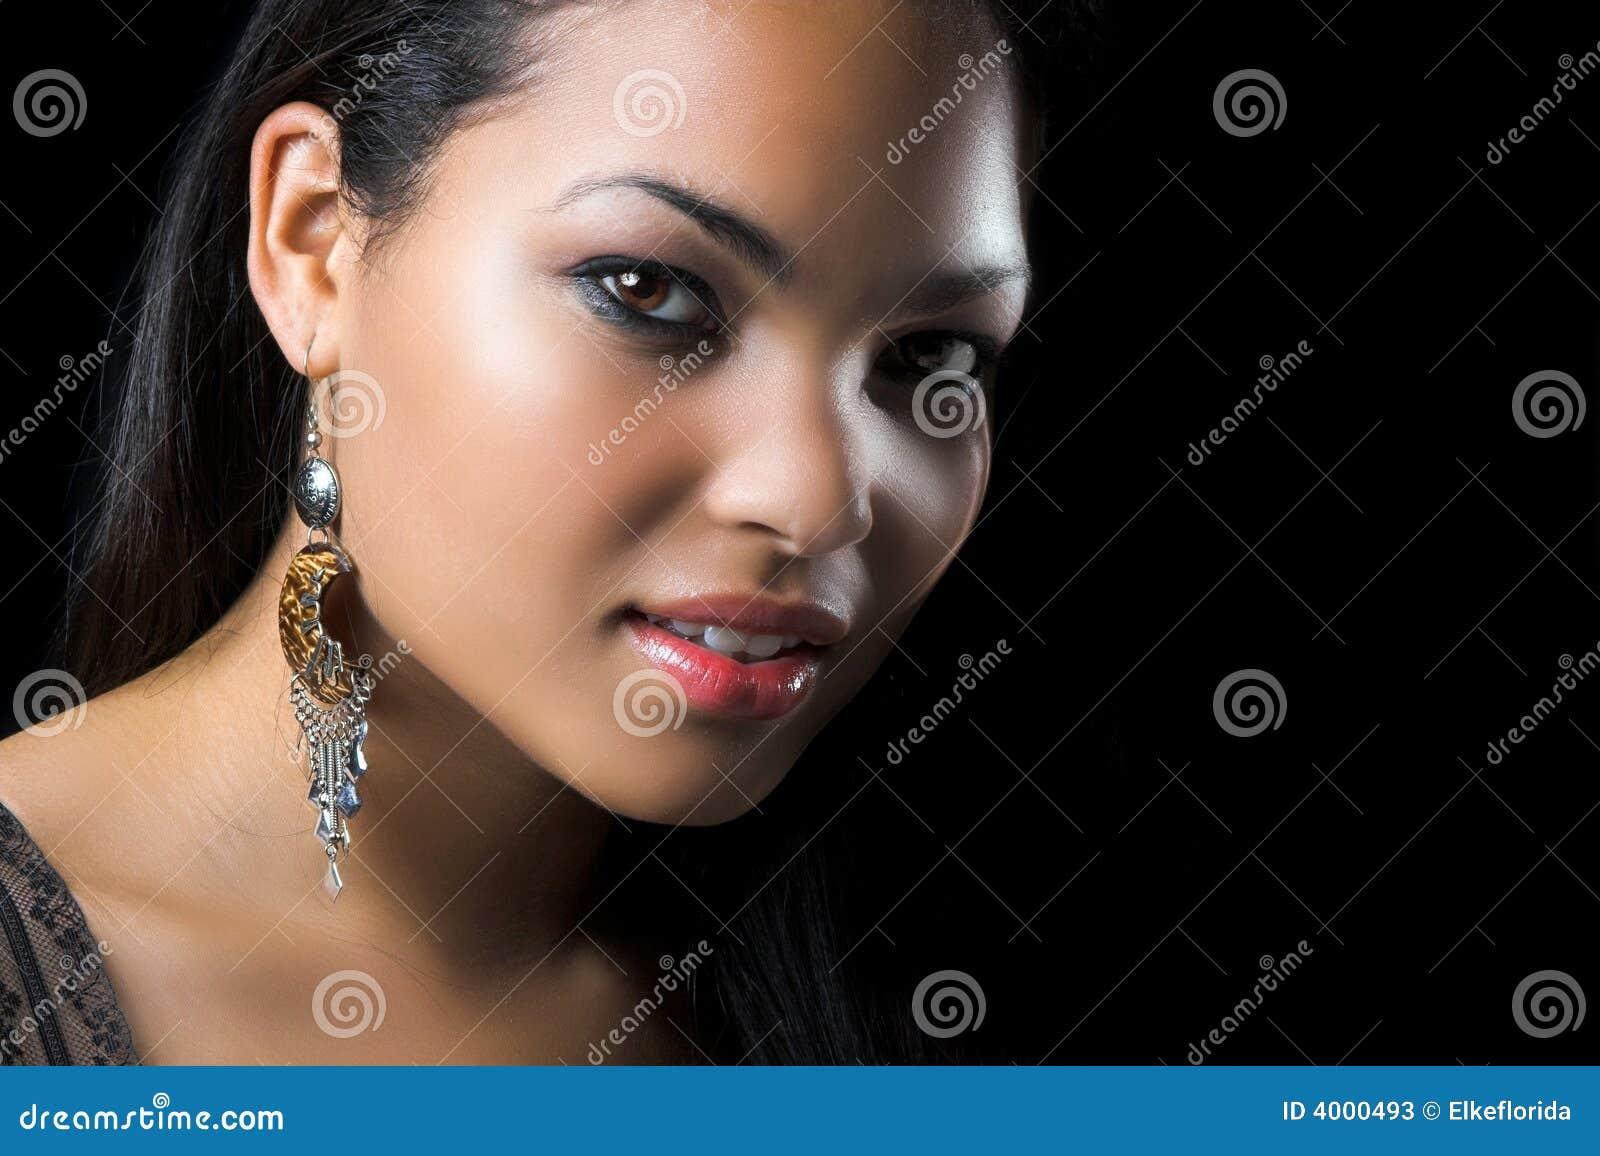 Wondered exotic latina woman naked